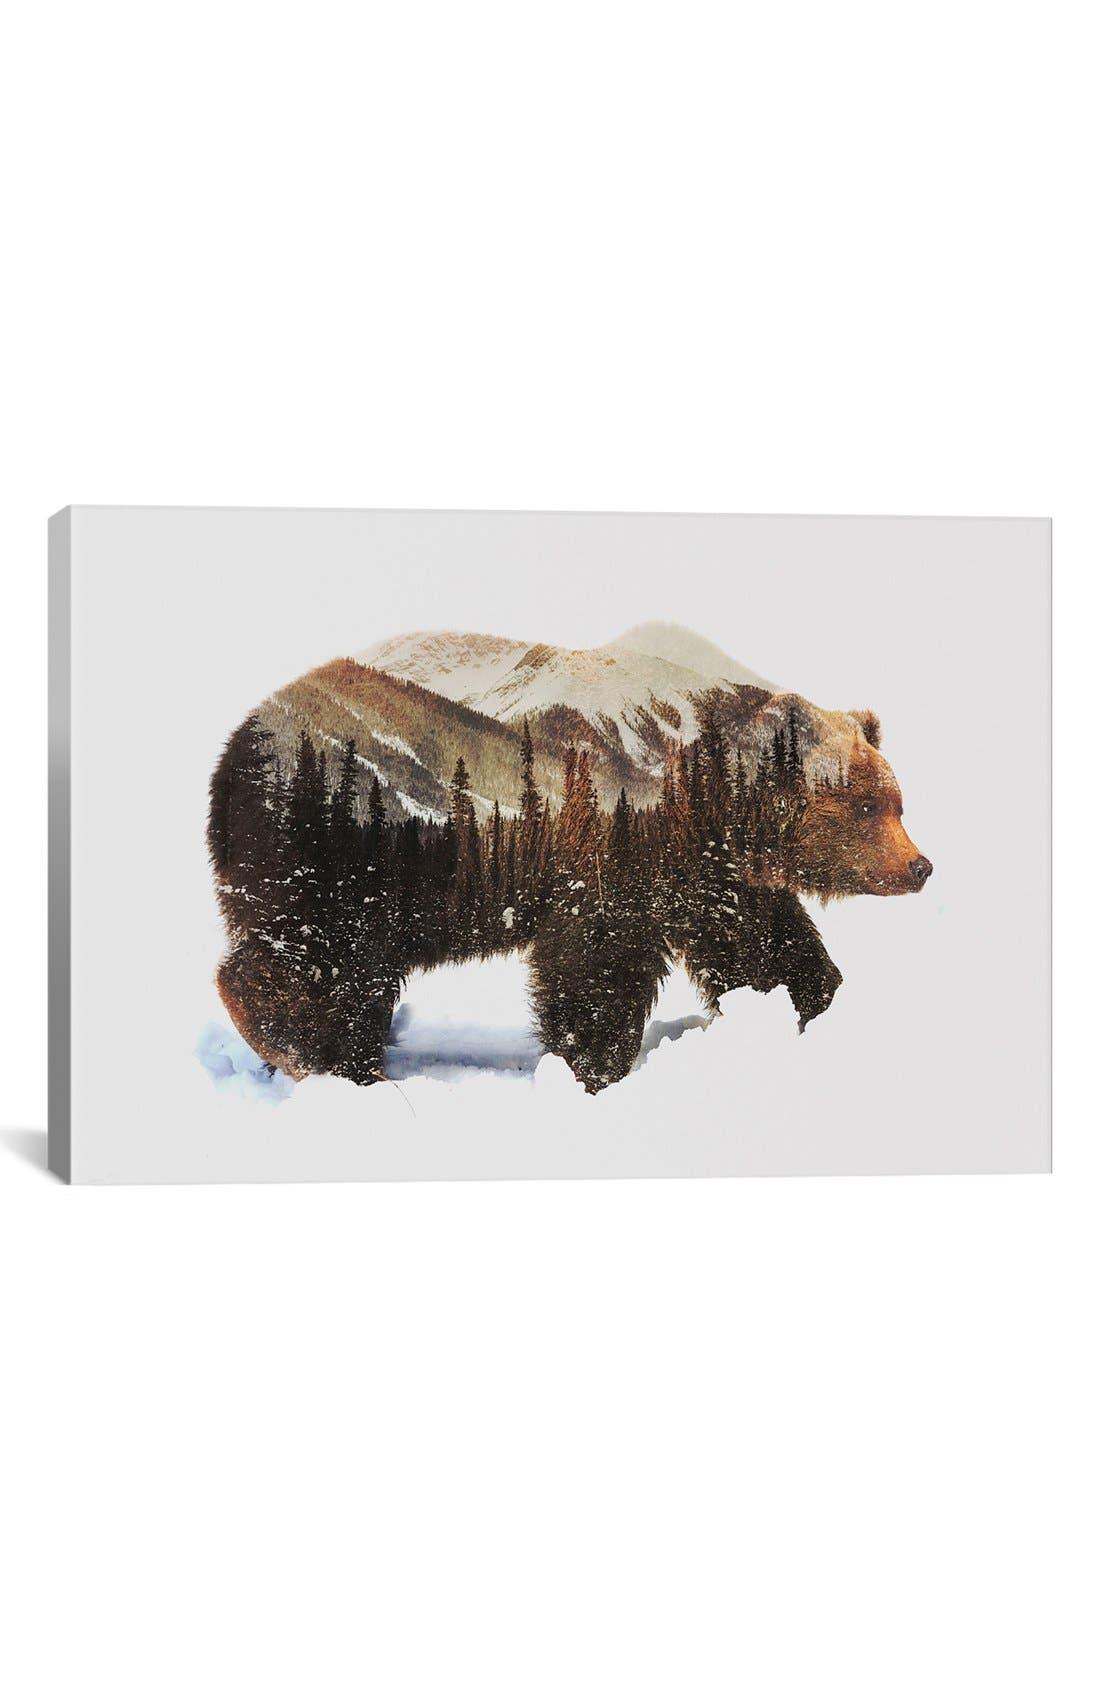 'Grizzly Bear' Giclée Print Canvas Art,                             Main thumbnail 1, color,                             200